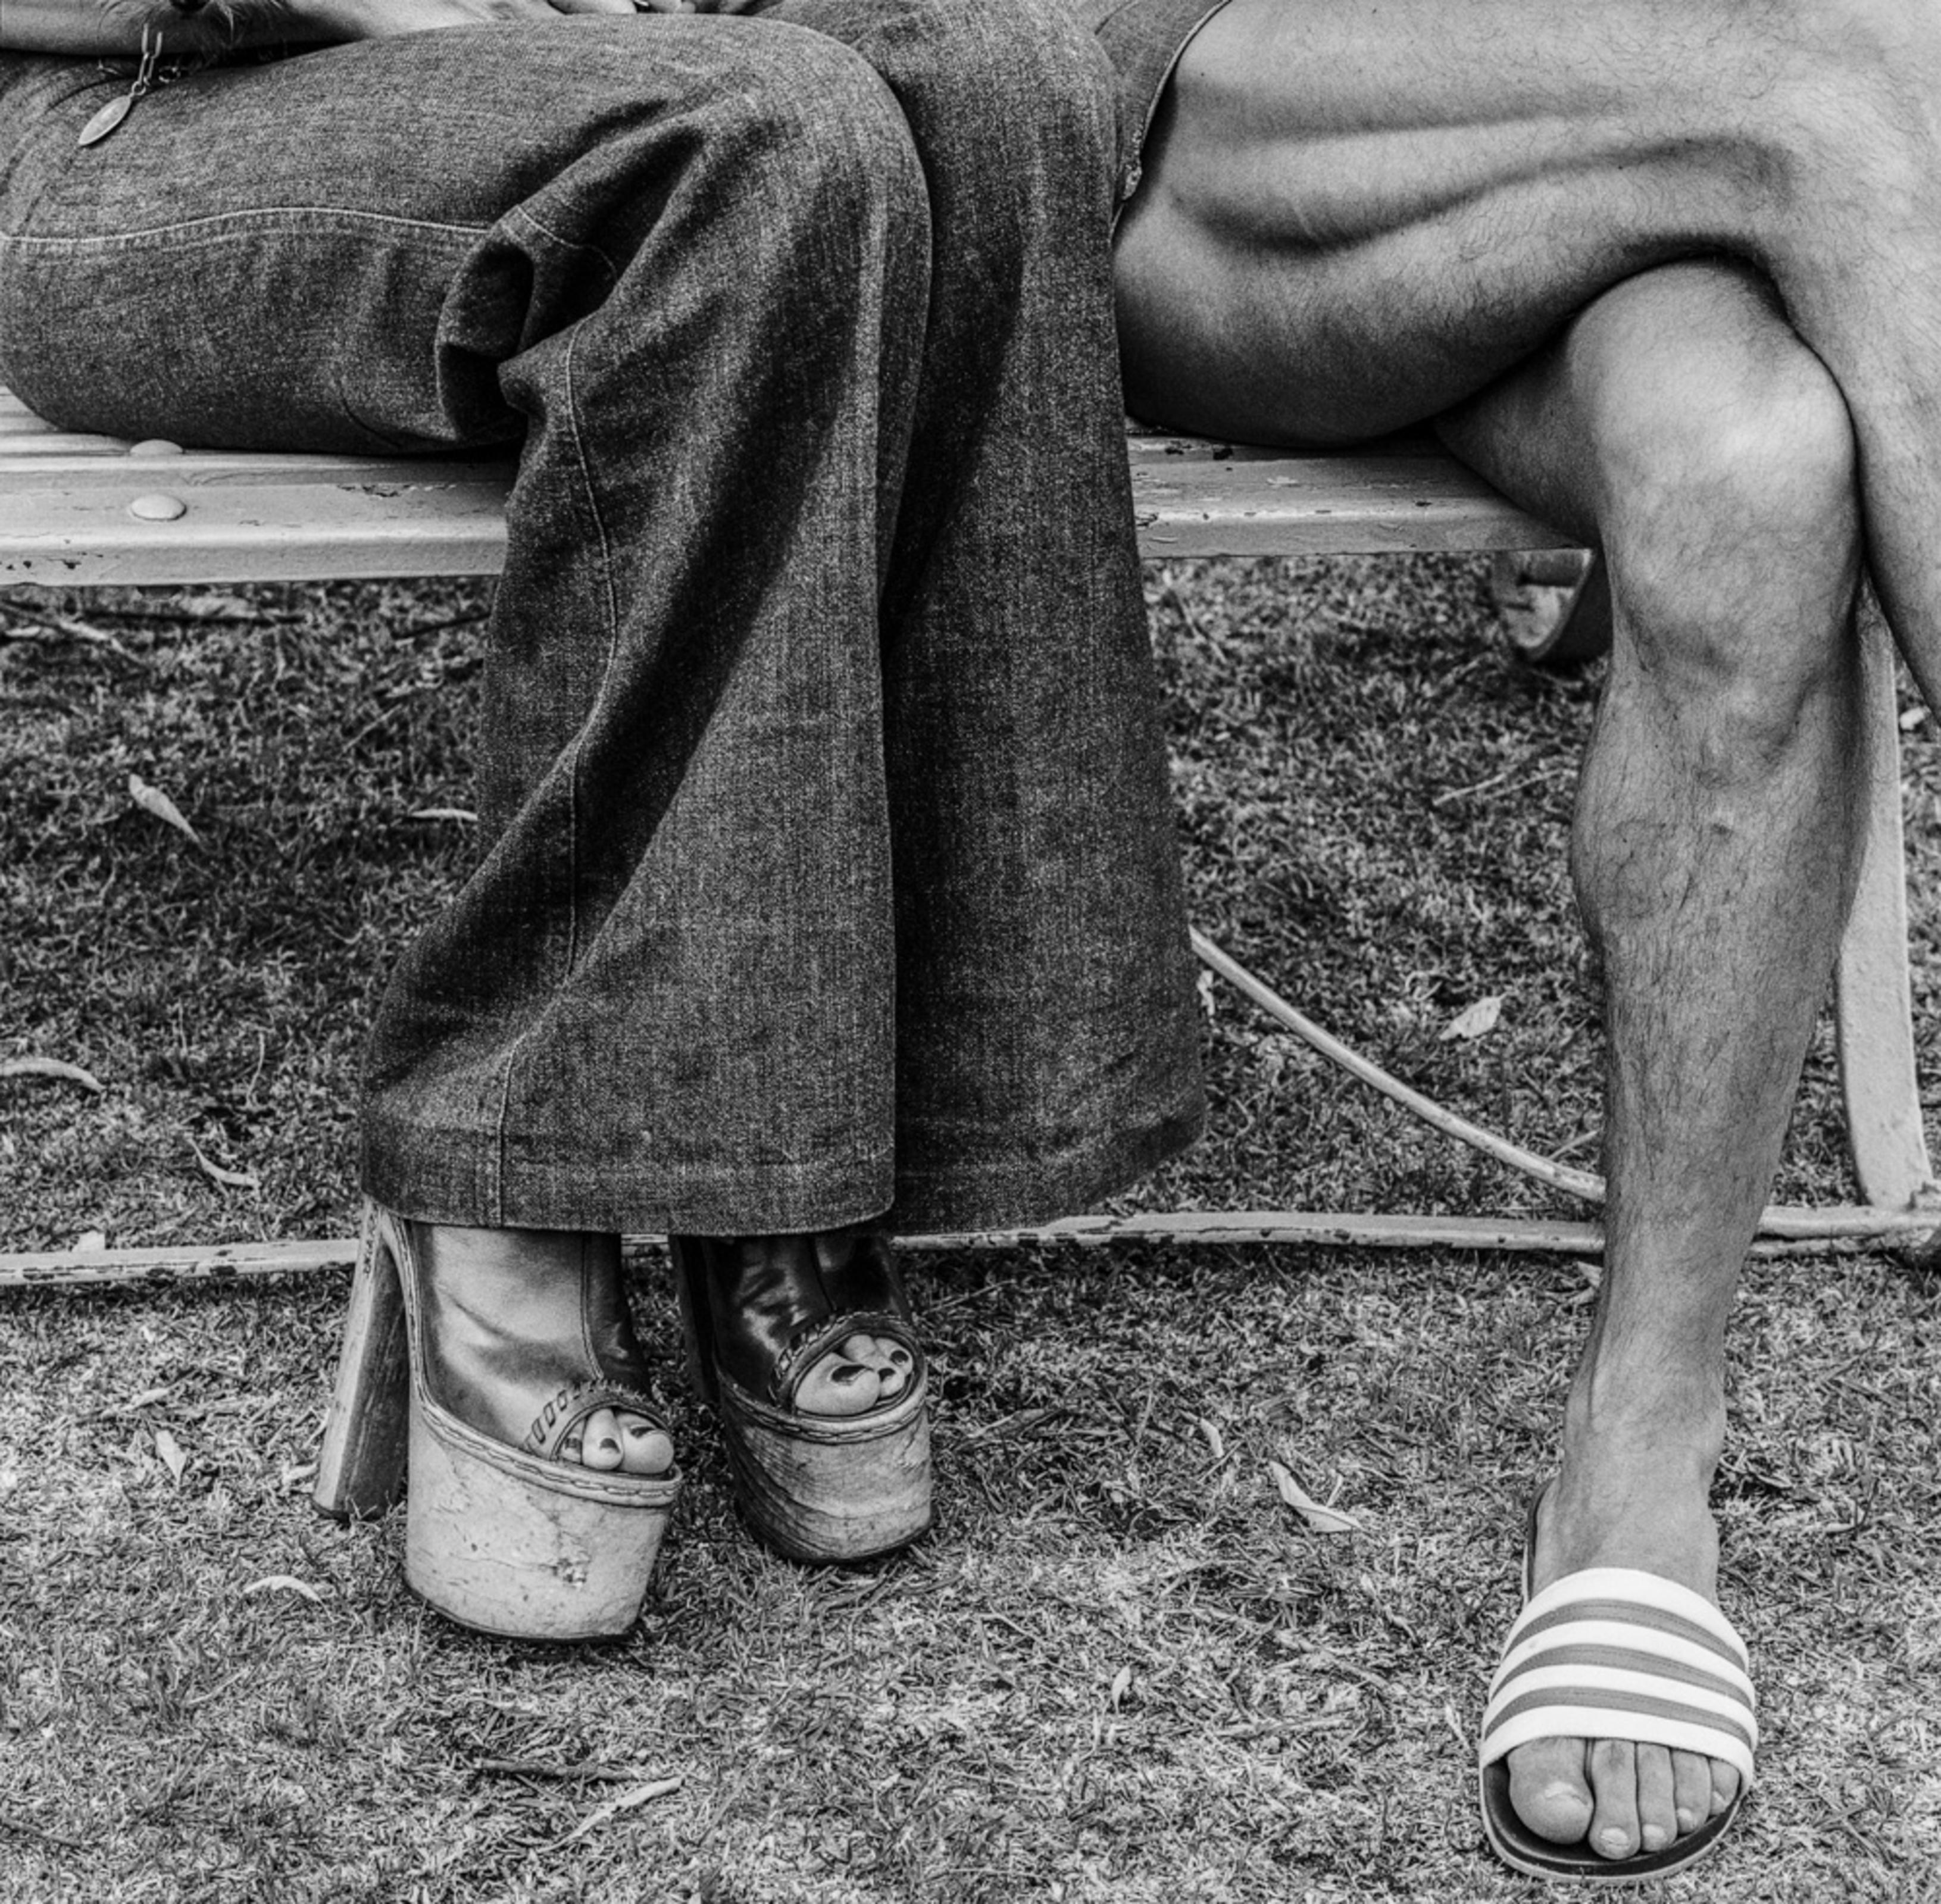 "David Goldblatt, Couple at The Wilds. Johannesburg., 1975. Vintage gelatin silver hand print, 14-1/4"" × 14-1/4"" (36.2 cm × 36.2 cm), image unique. © The David Goldblatt Legacy Trust."